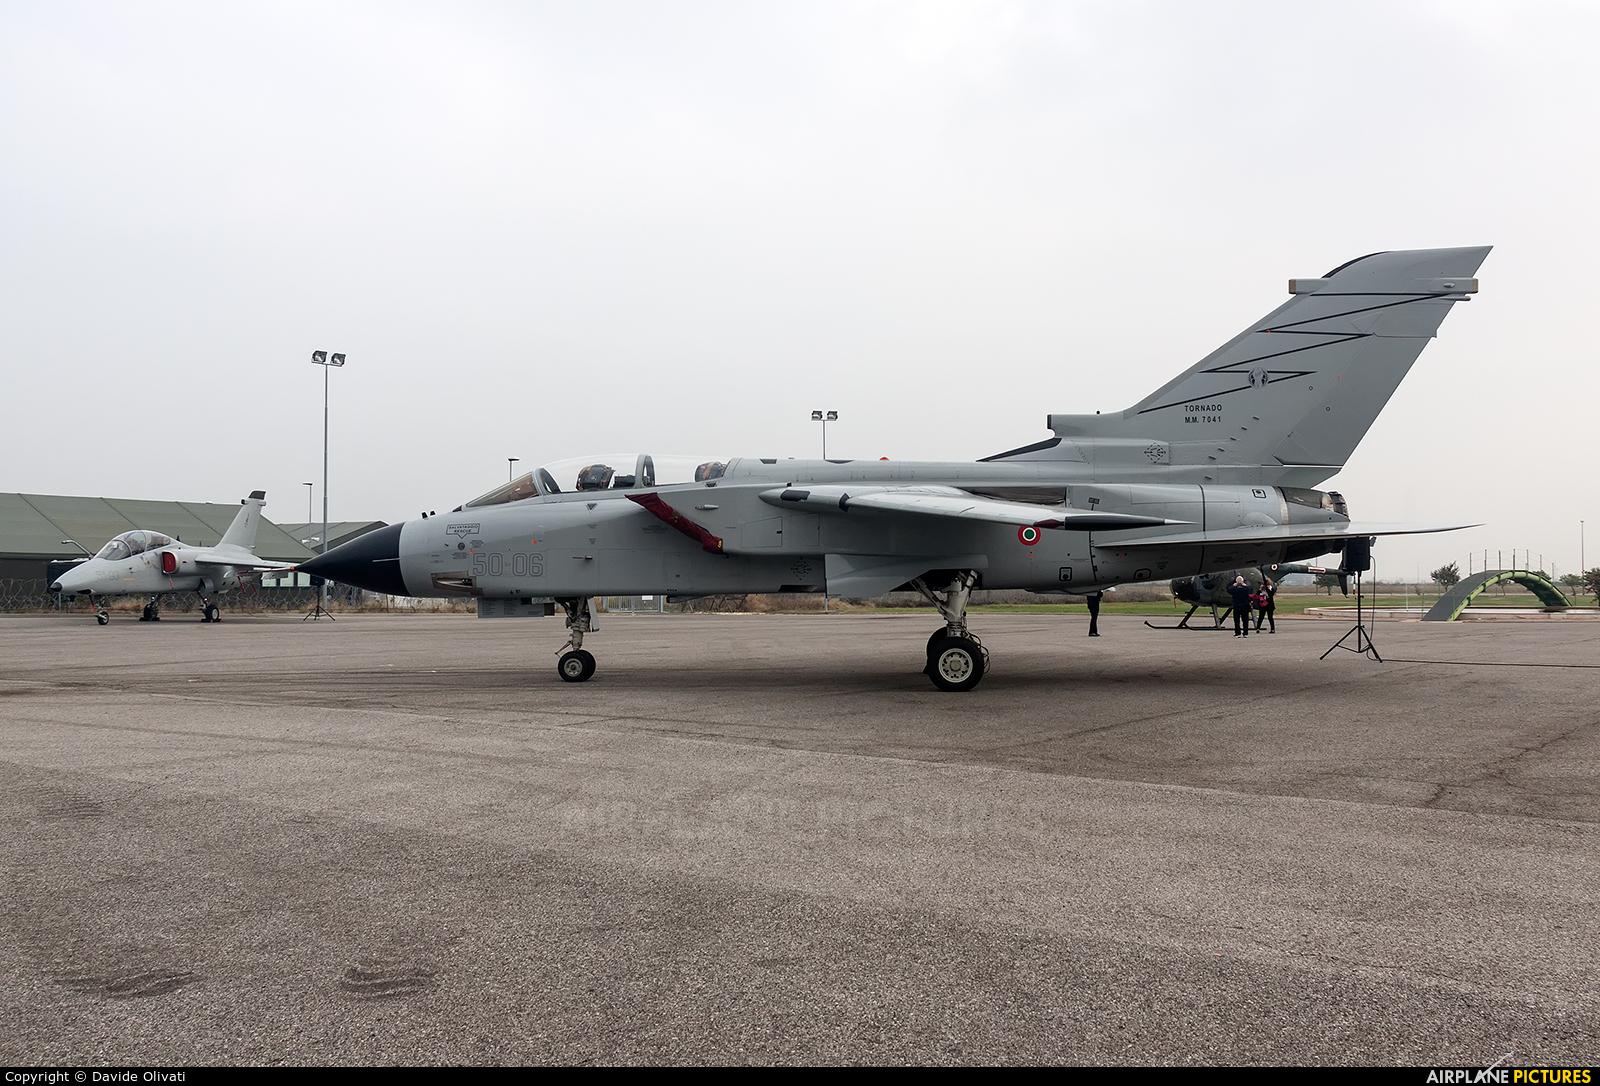 Italy - Air Force MM7041 aircraft at Off Airport - Italy